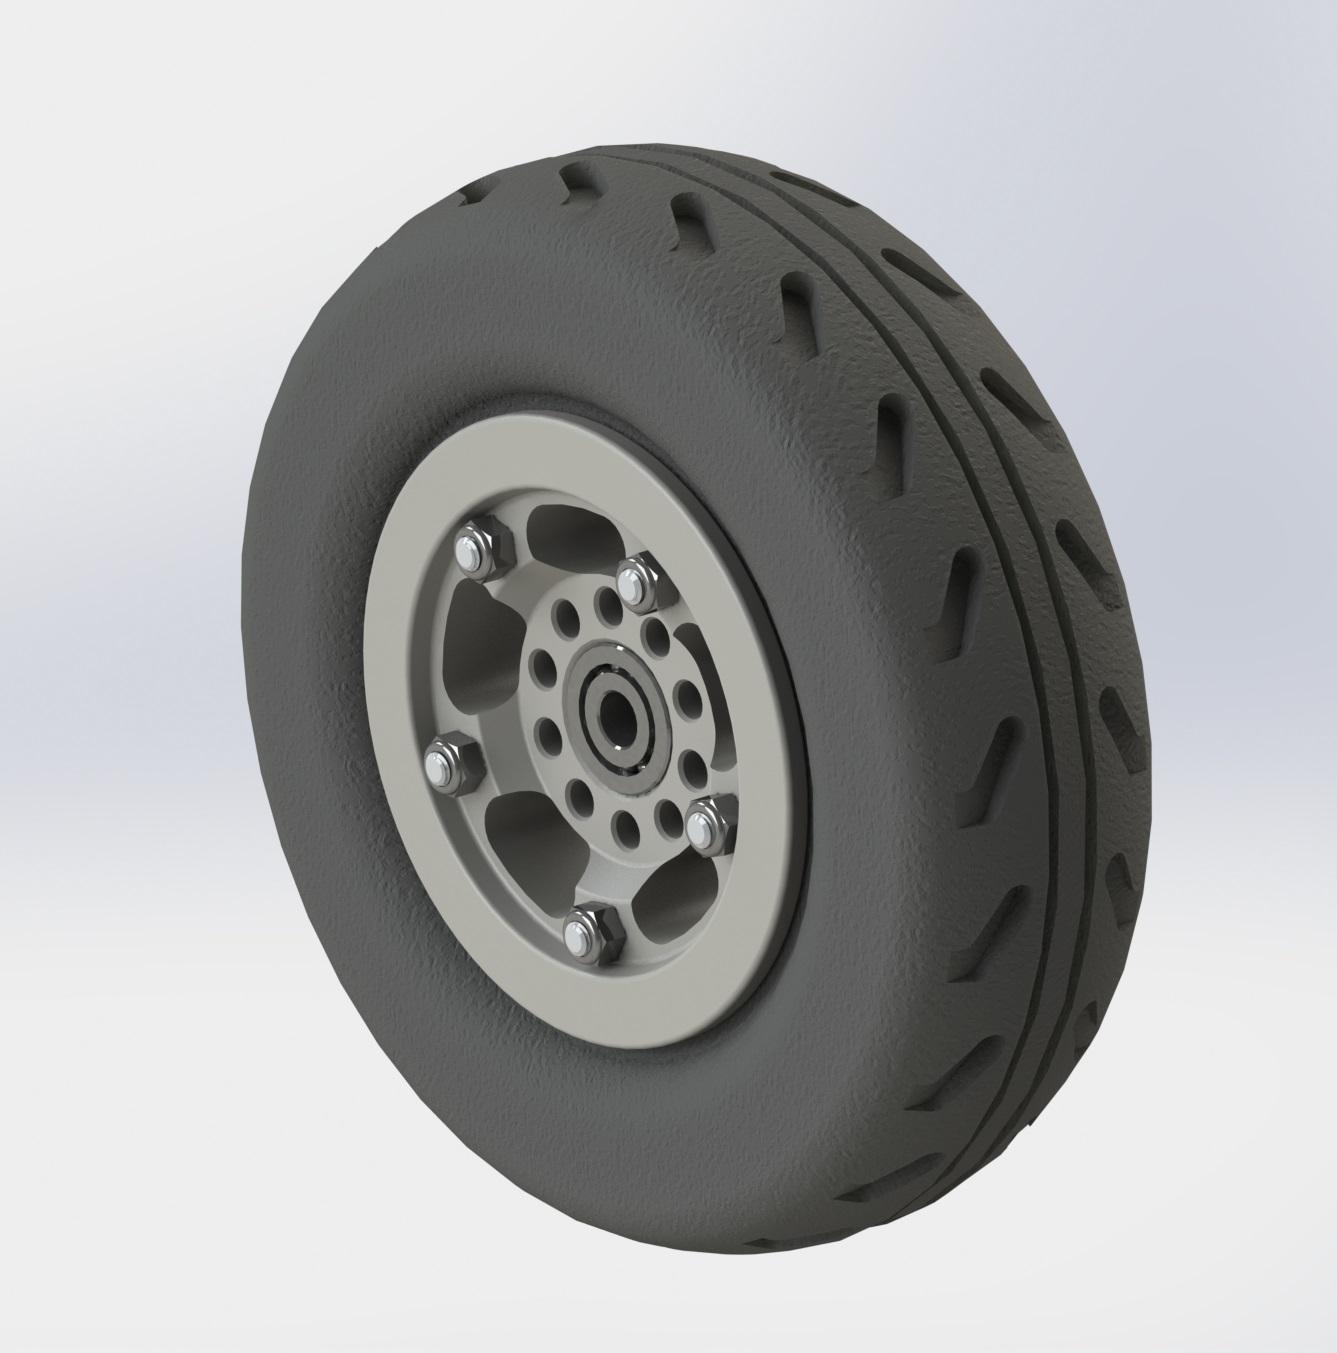 elofty_wheel4